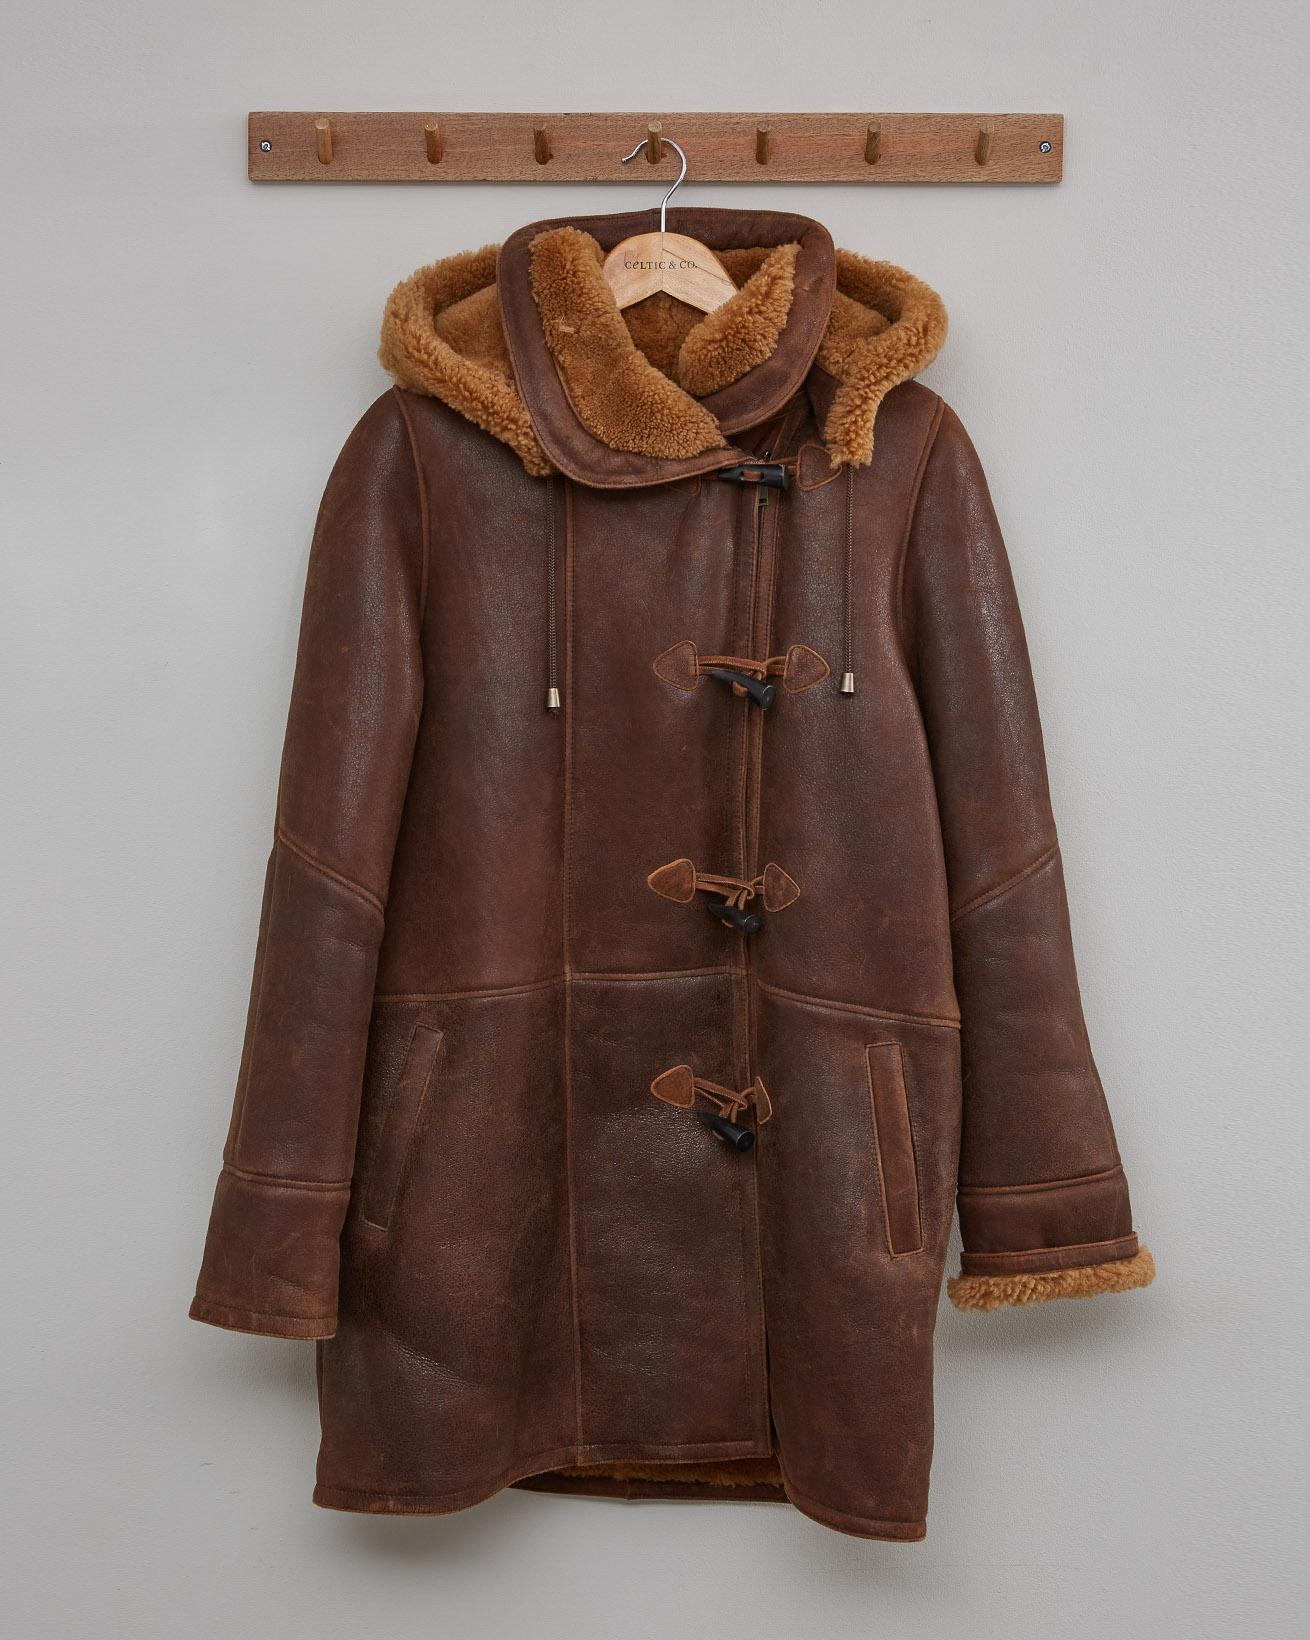 CELTIC DUFFLE COAT - AUTUMN BROWN, GINGER - Size 10 - 2552